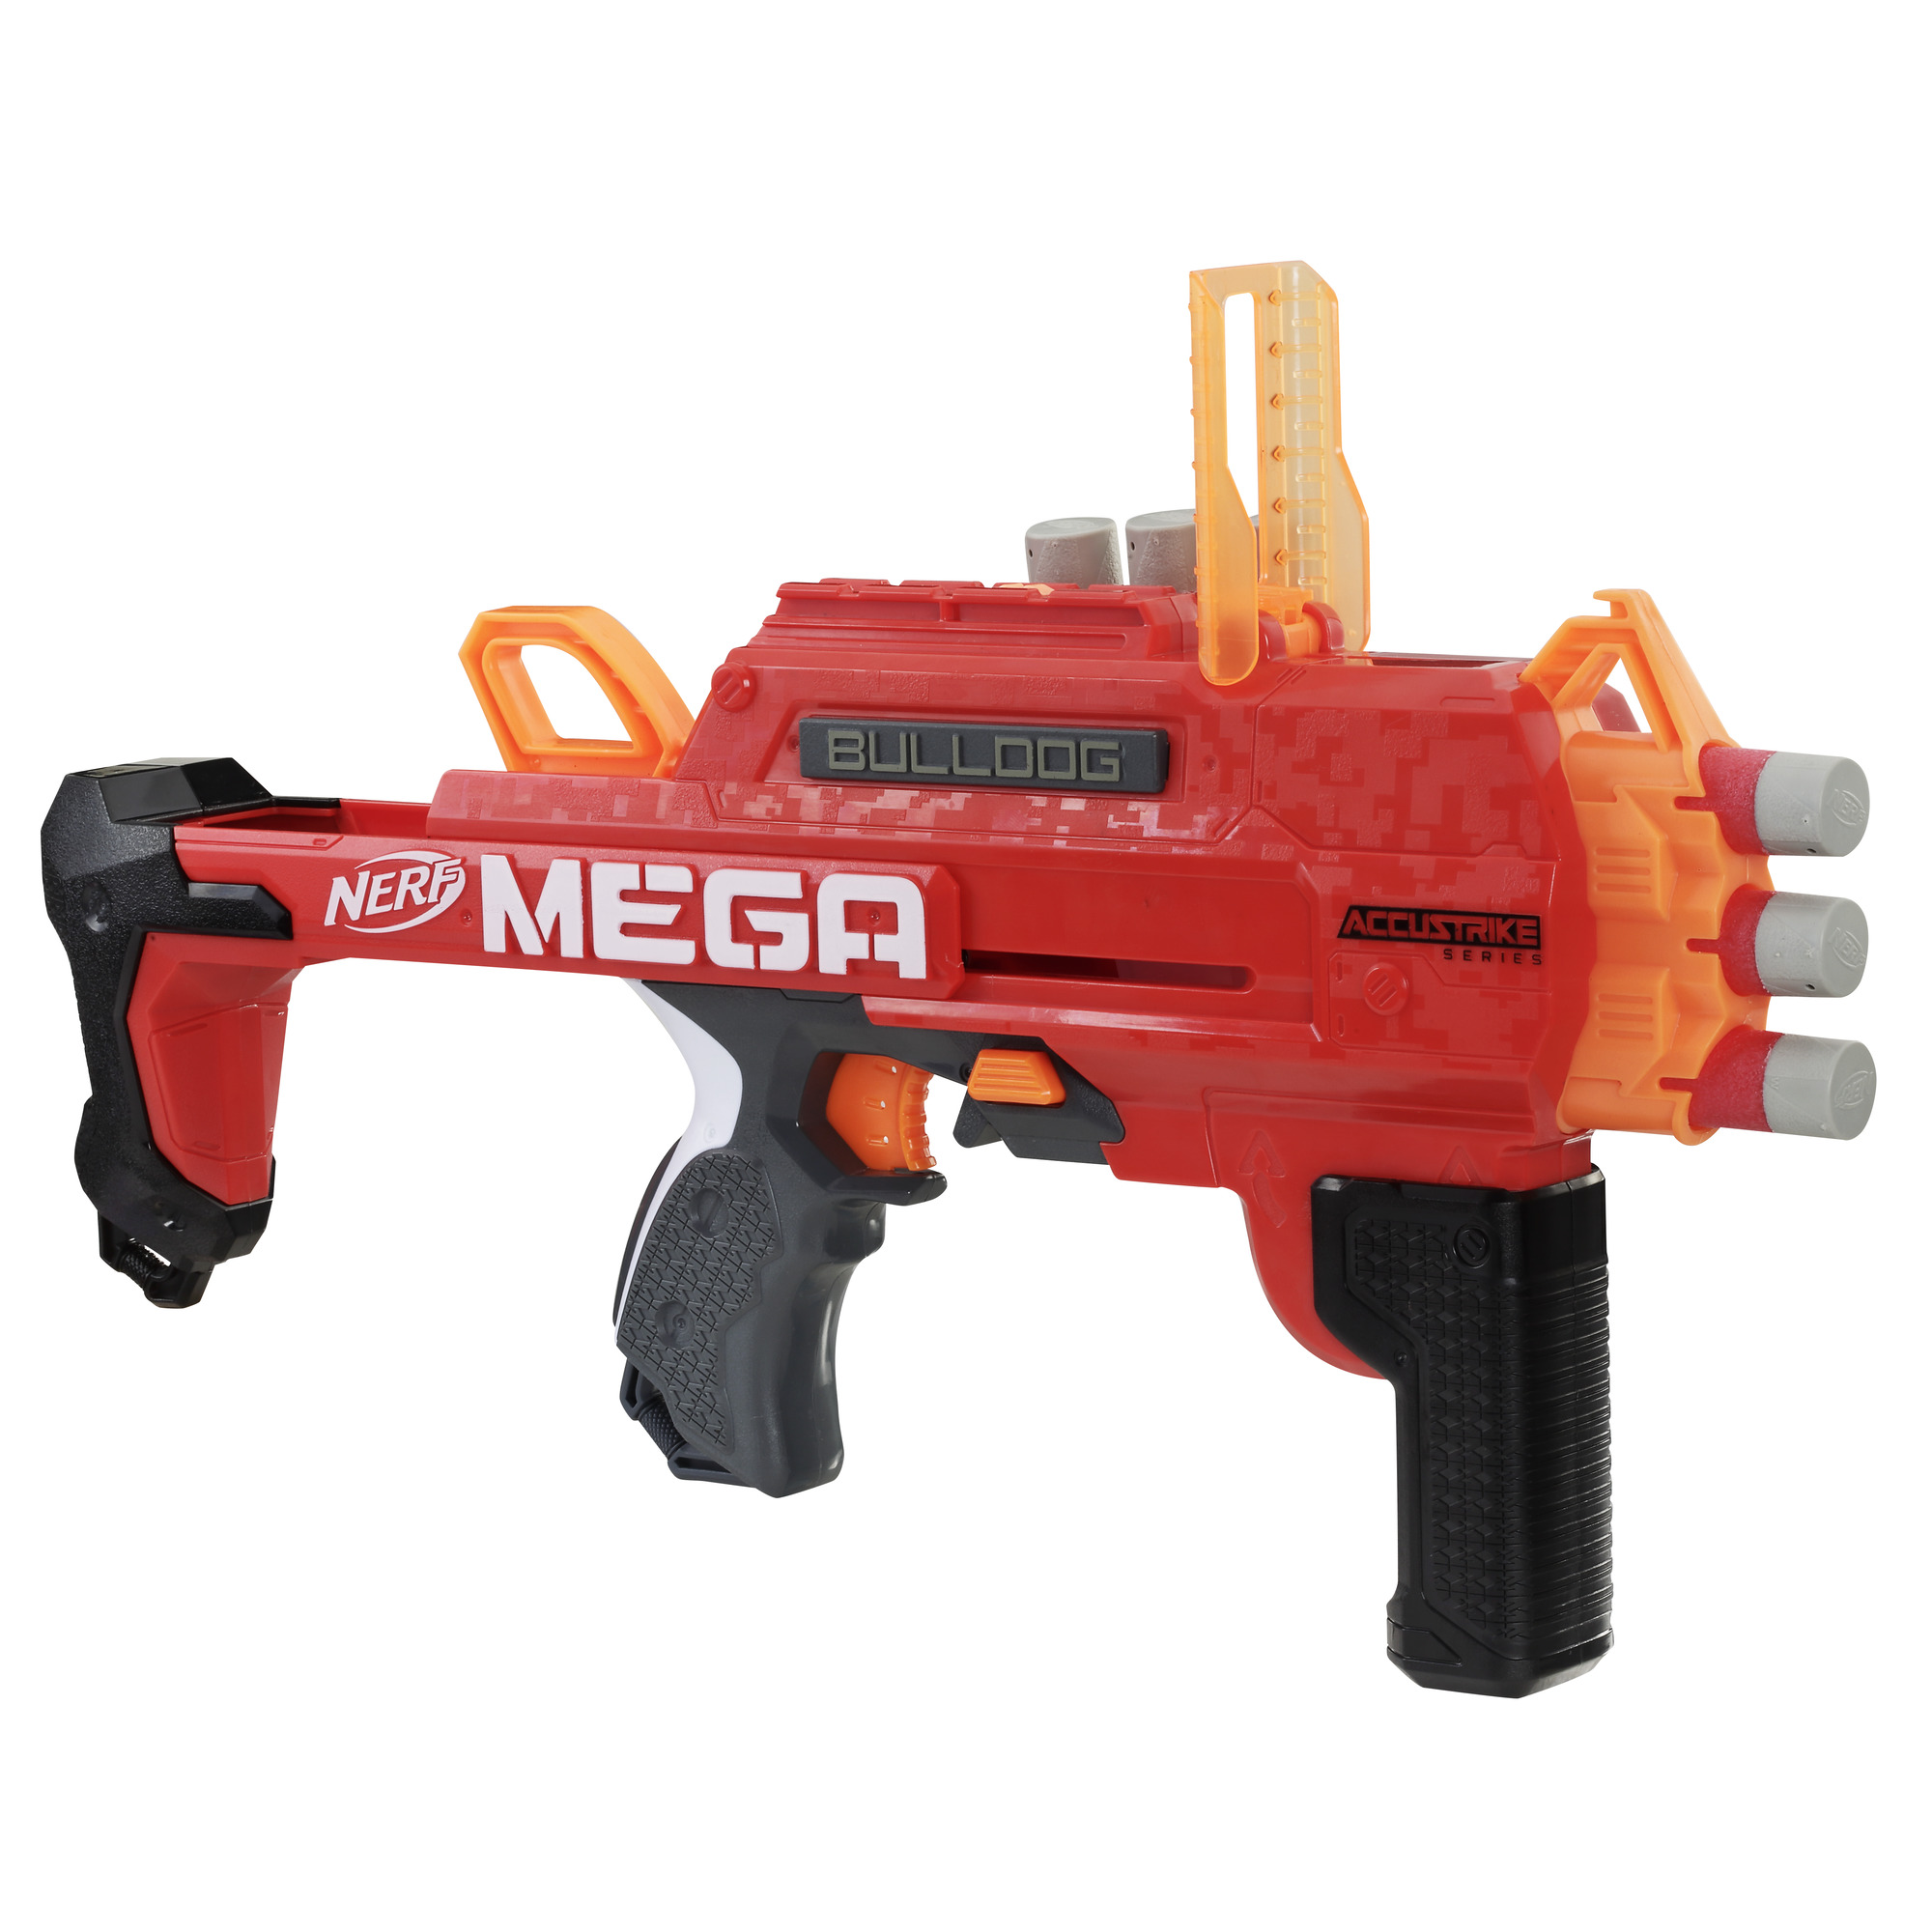 Nerf Mega Bulldog.jpeg